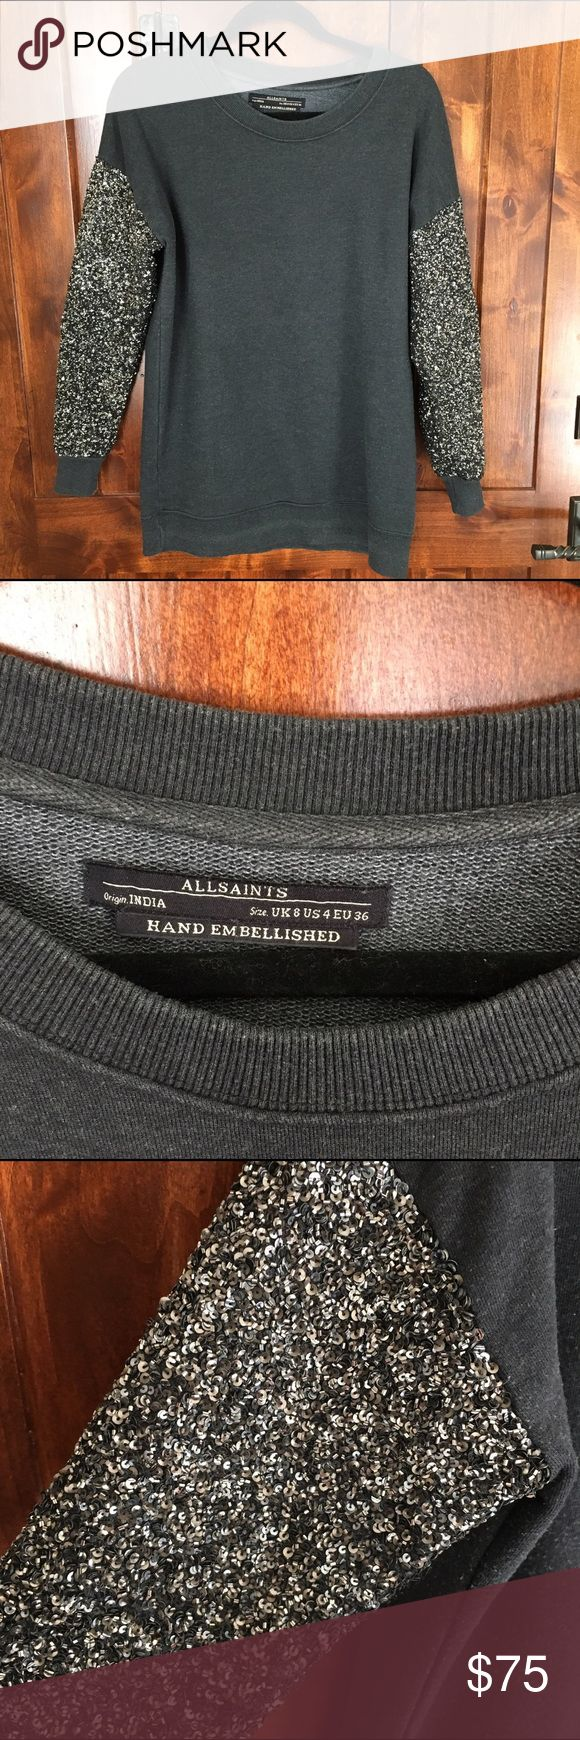 ALLSAINTS Hand Embellished sweater - 4 Made in India. Slight wear. Great condition. Beautiful sequin sweatshirt!!!!! All Saints Tops Sweatshirts & Hoodies